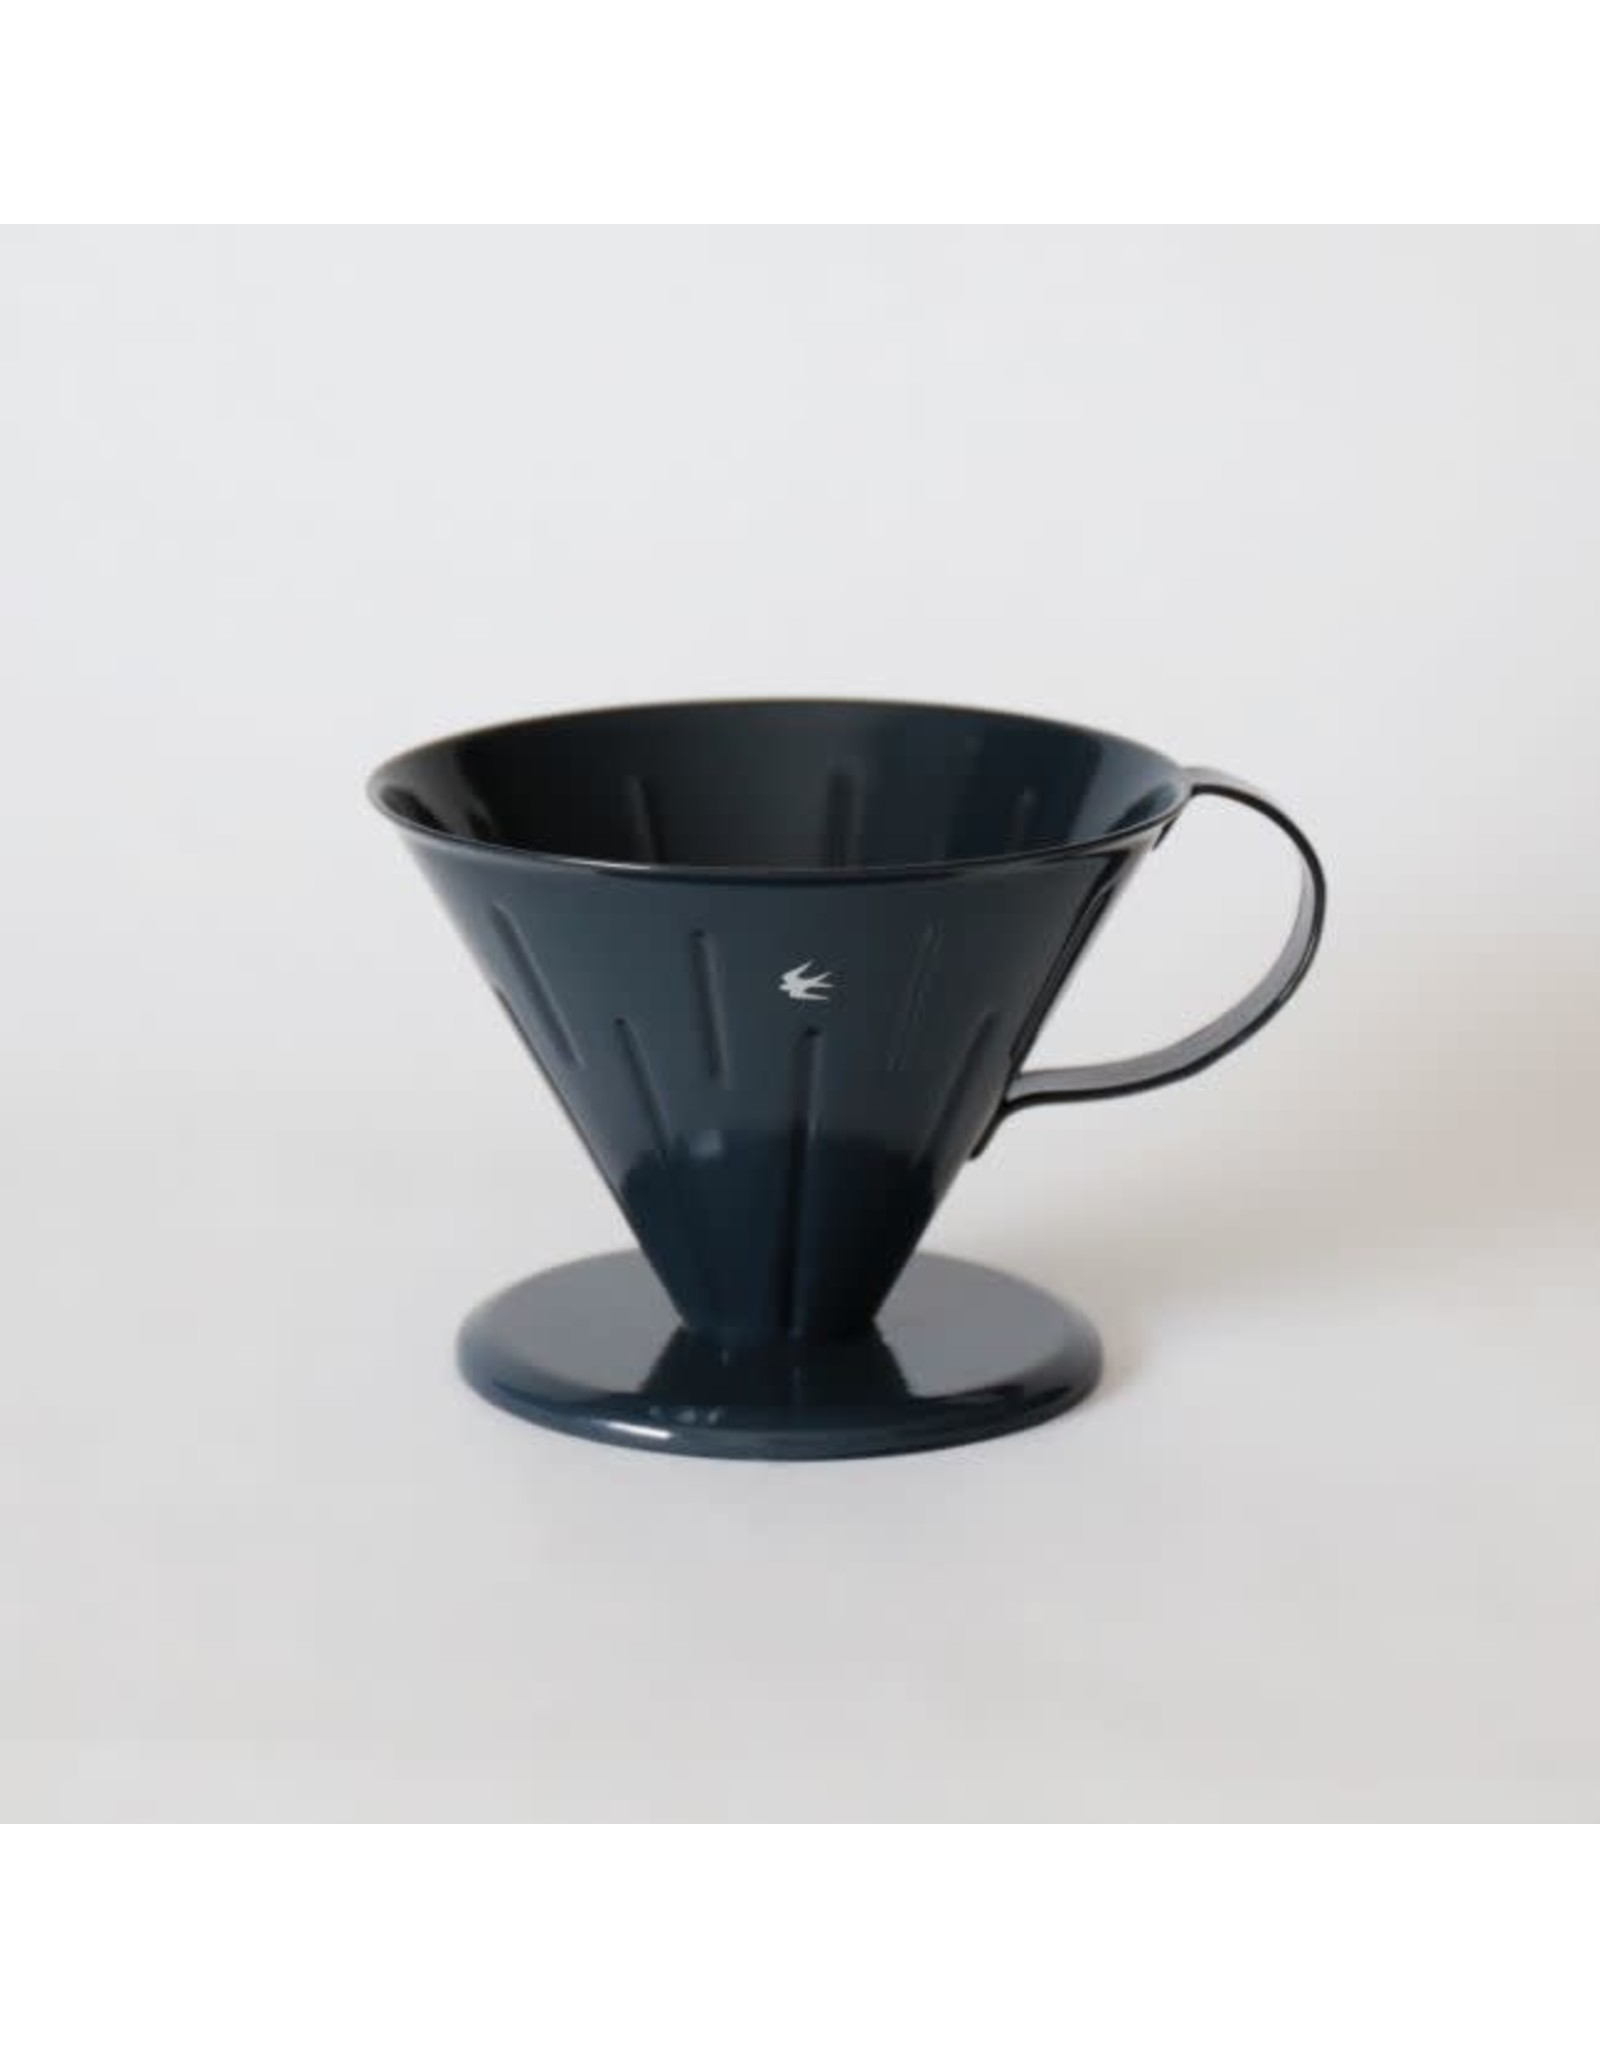 GSP GSP TSUBAME COFFEE DRIPPER 4.0 NAVY